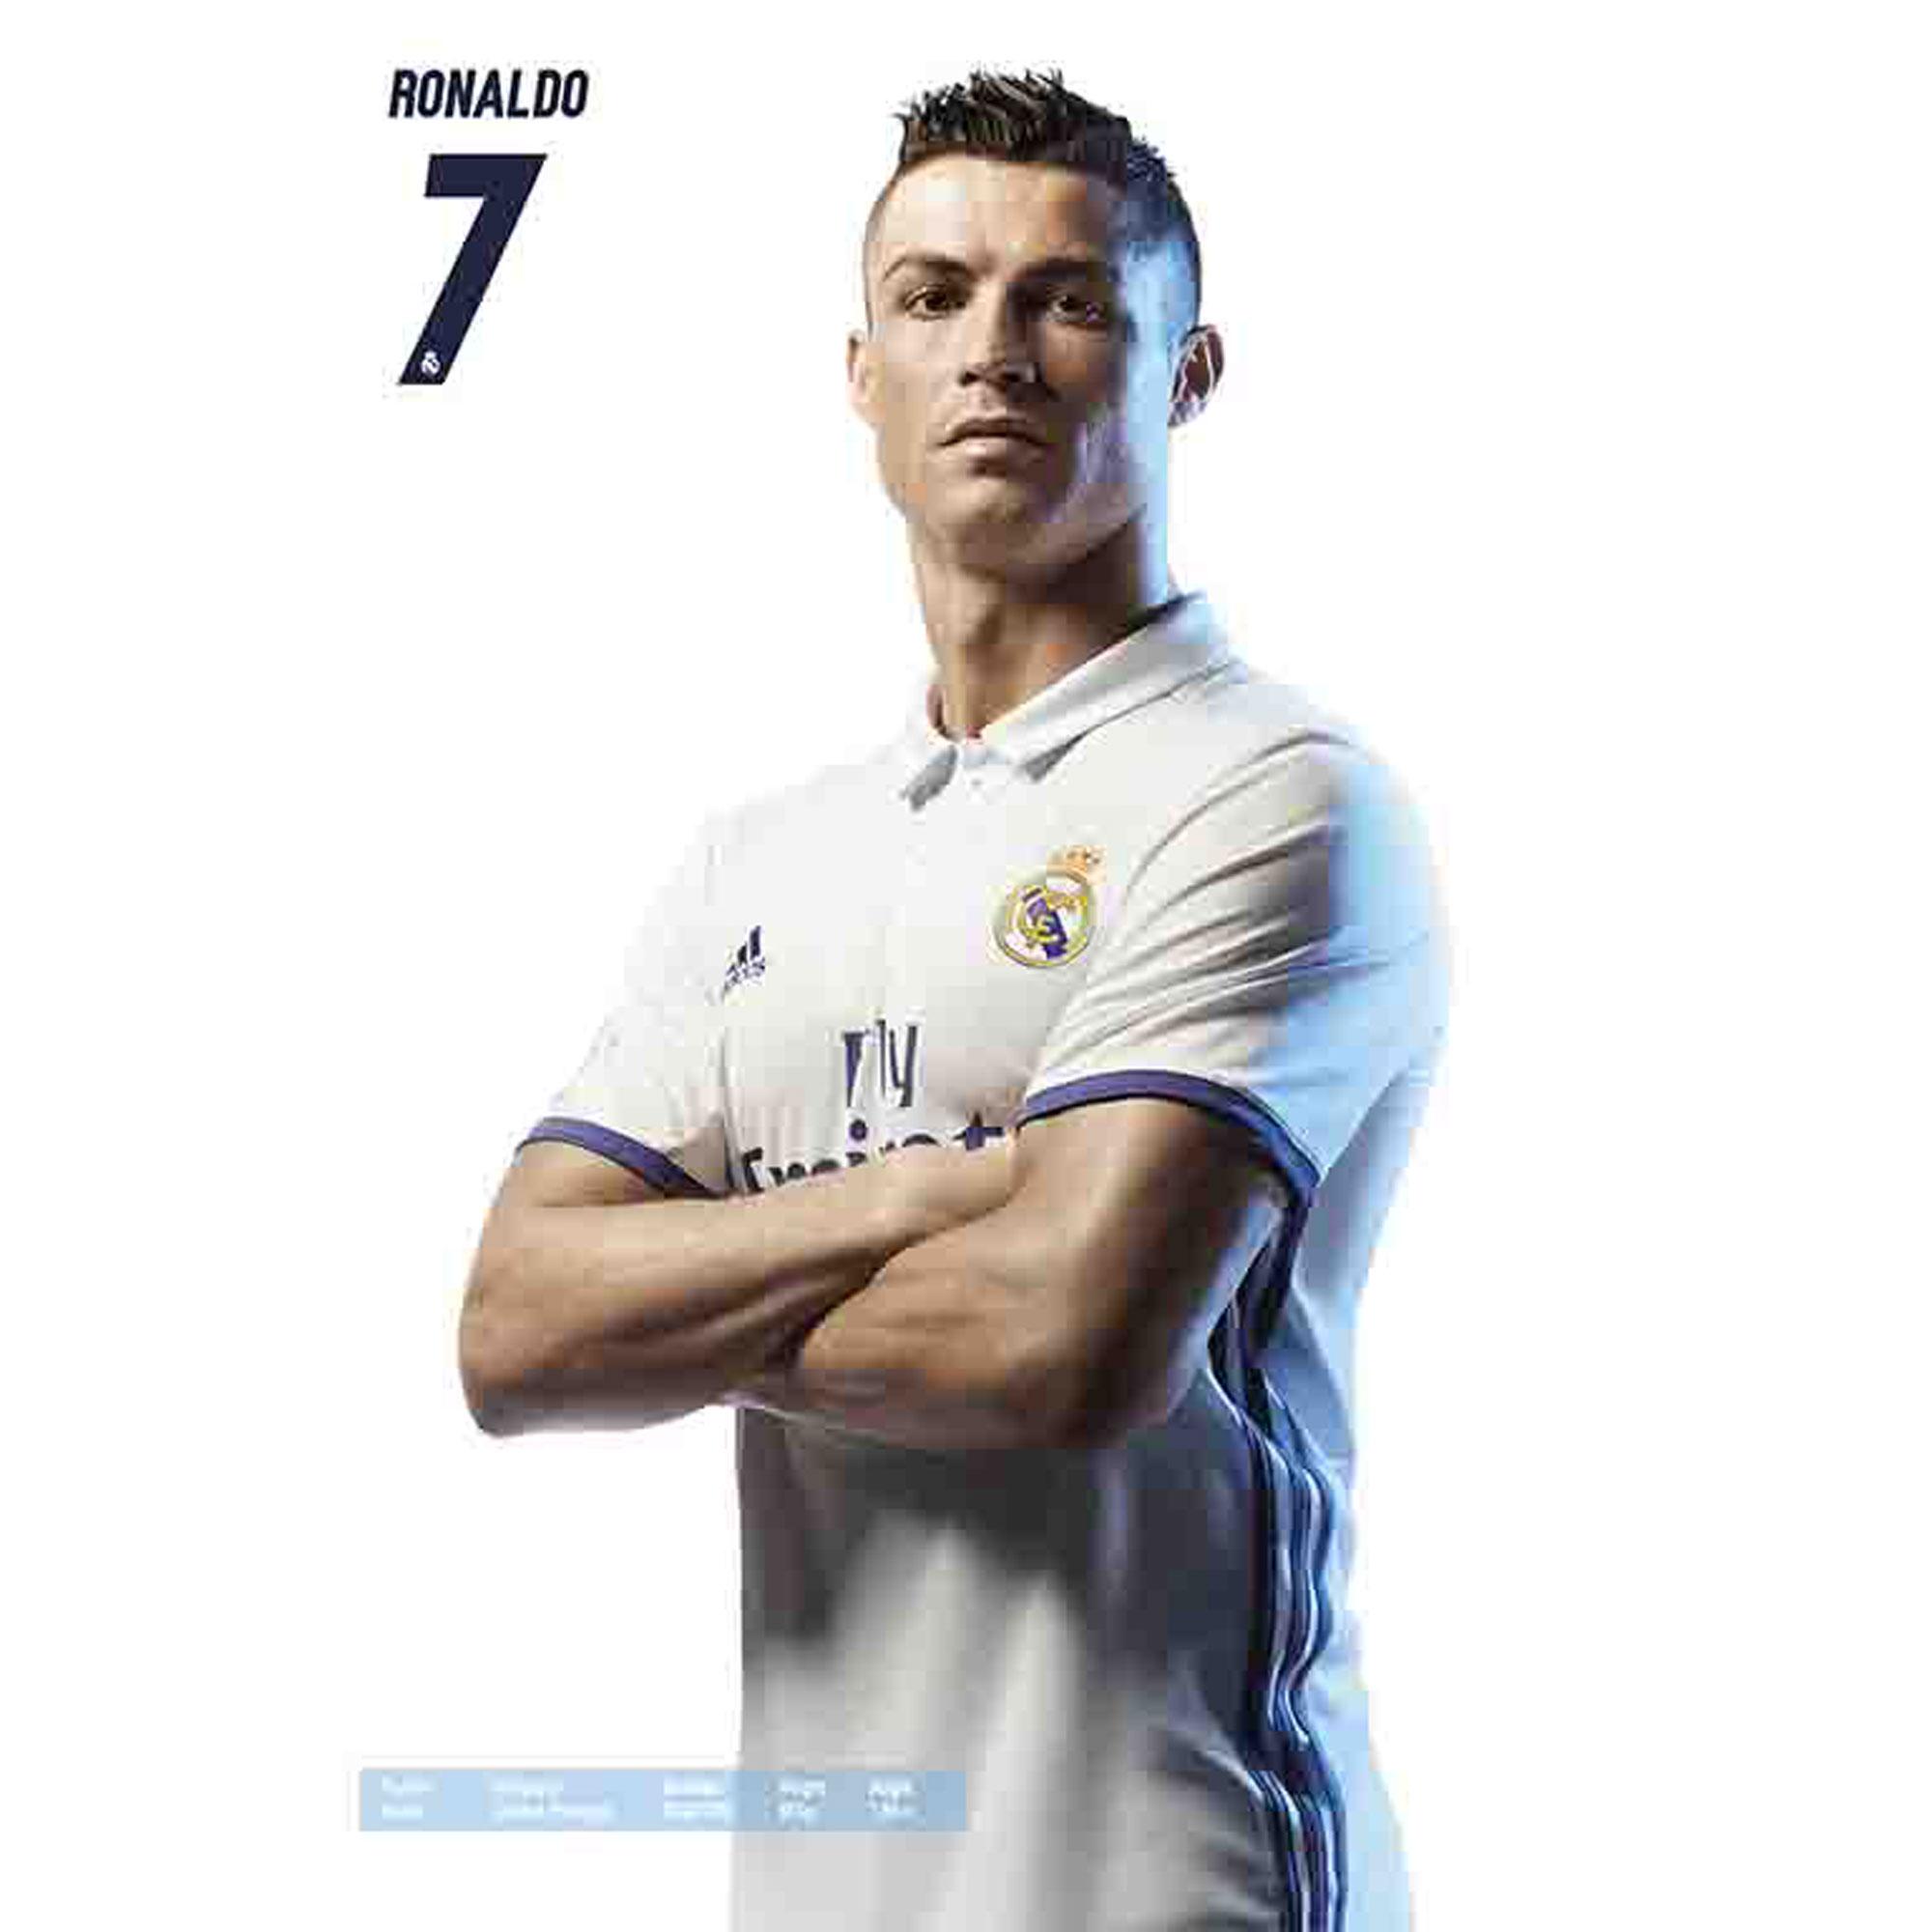 fußball  real madrid cristiano ronaldo  fussball poster